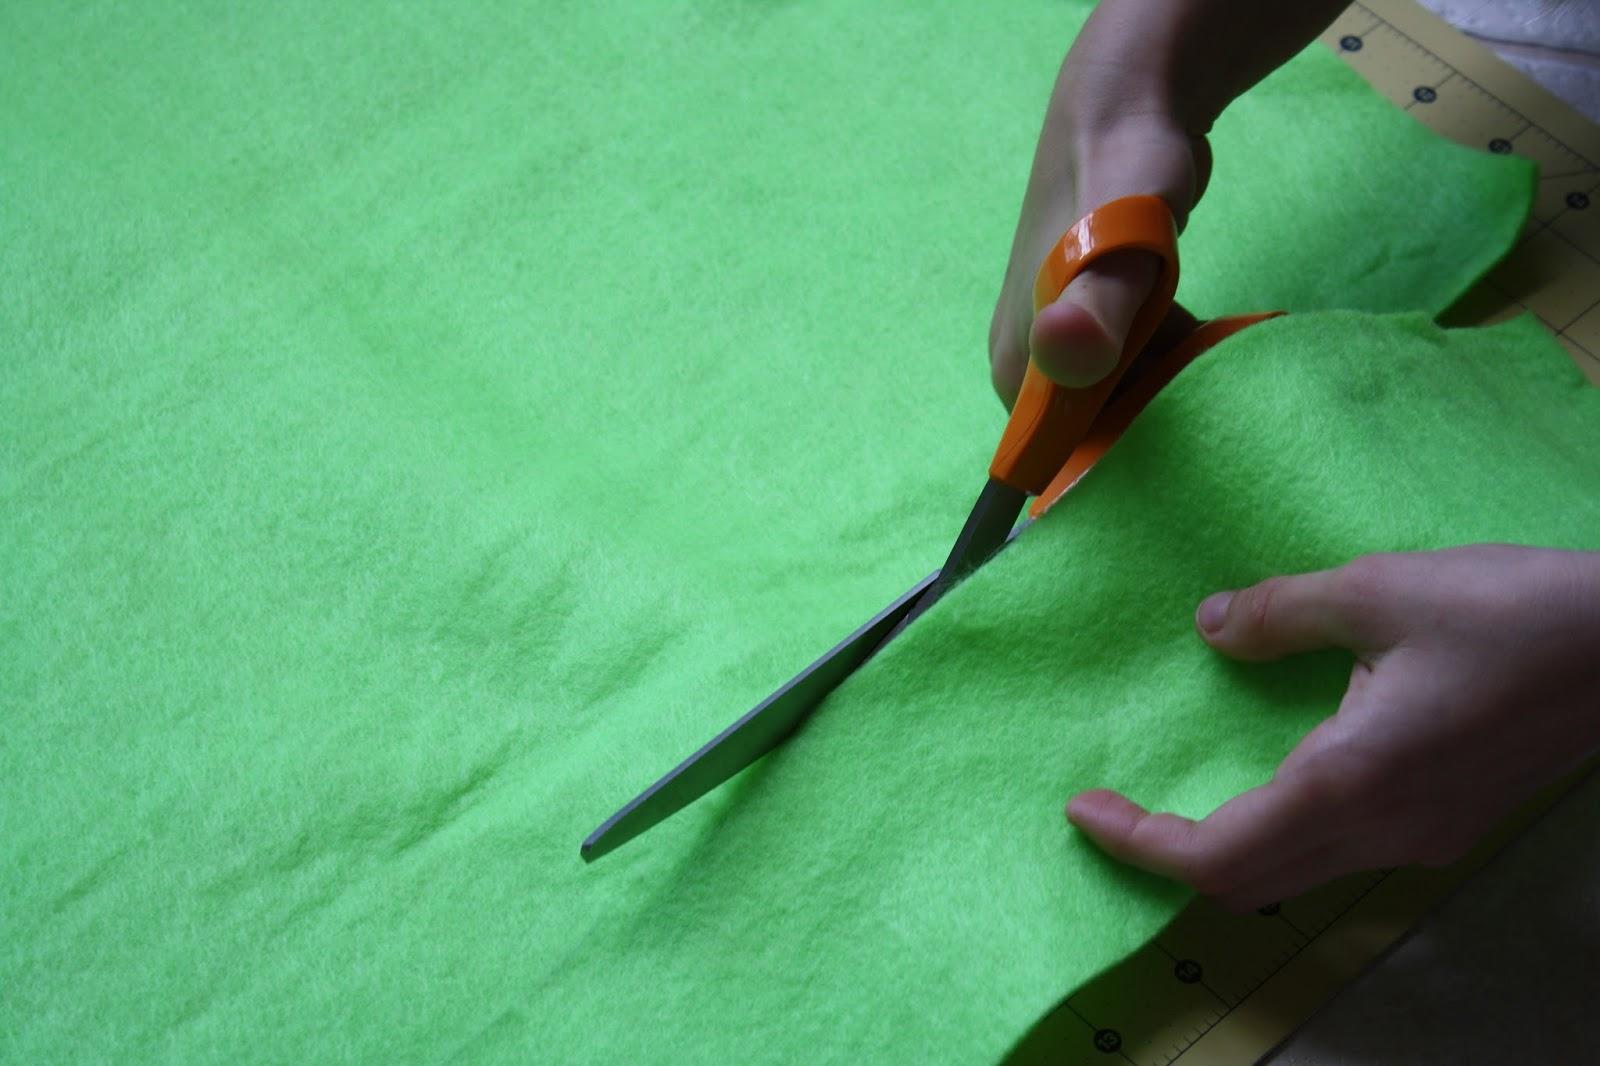 Step 1 of Bunny Costume, Cut the felt